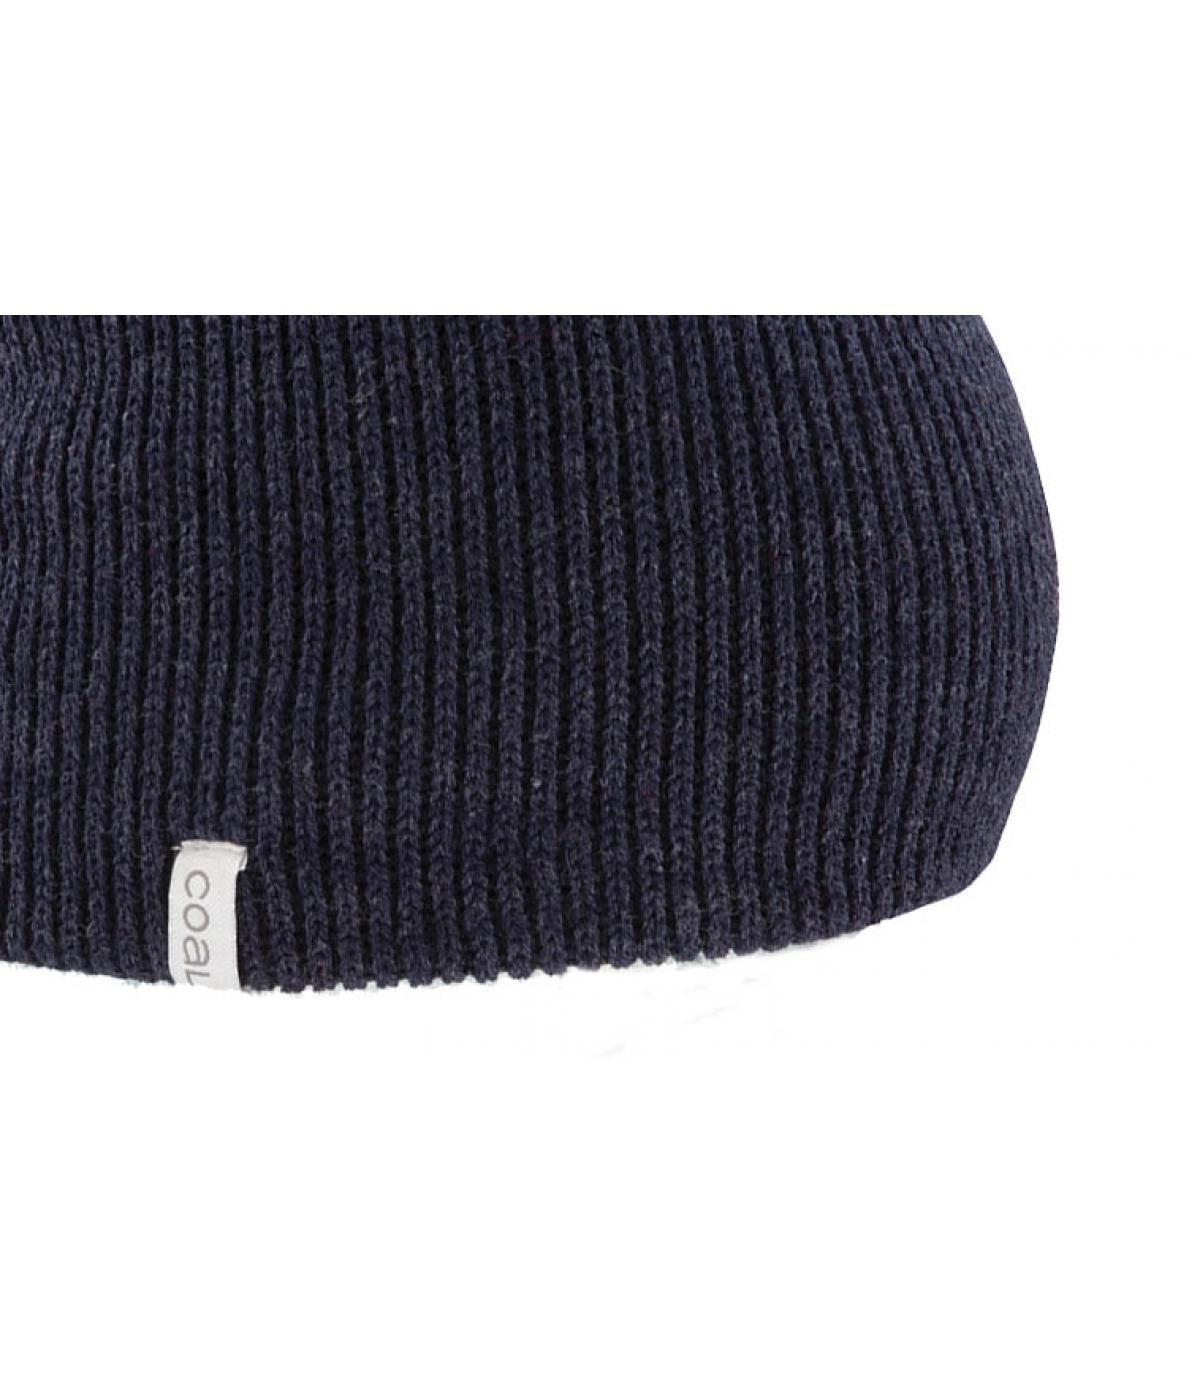 Bonnet long bleu chiné